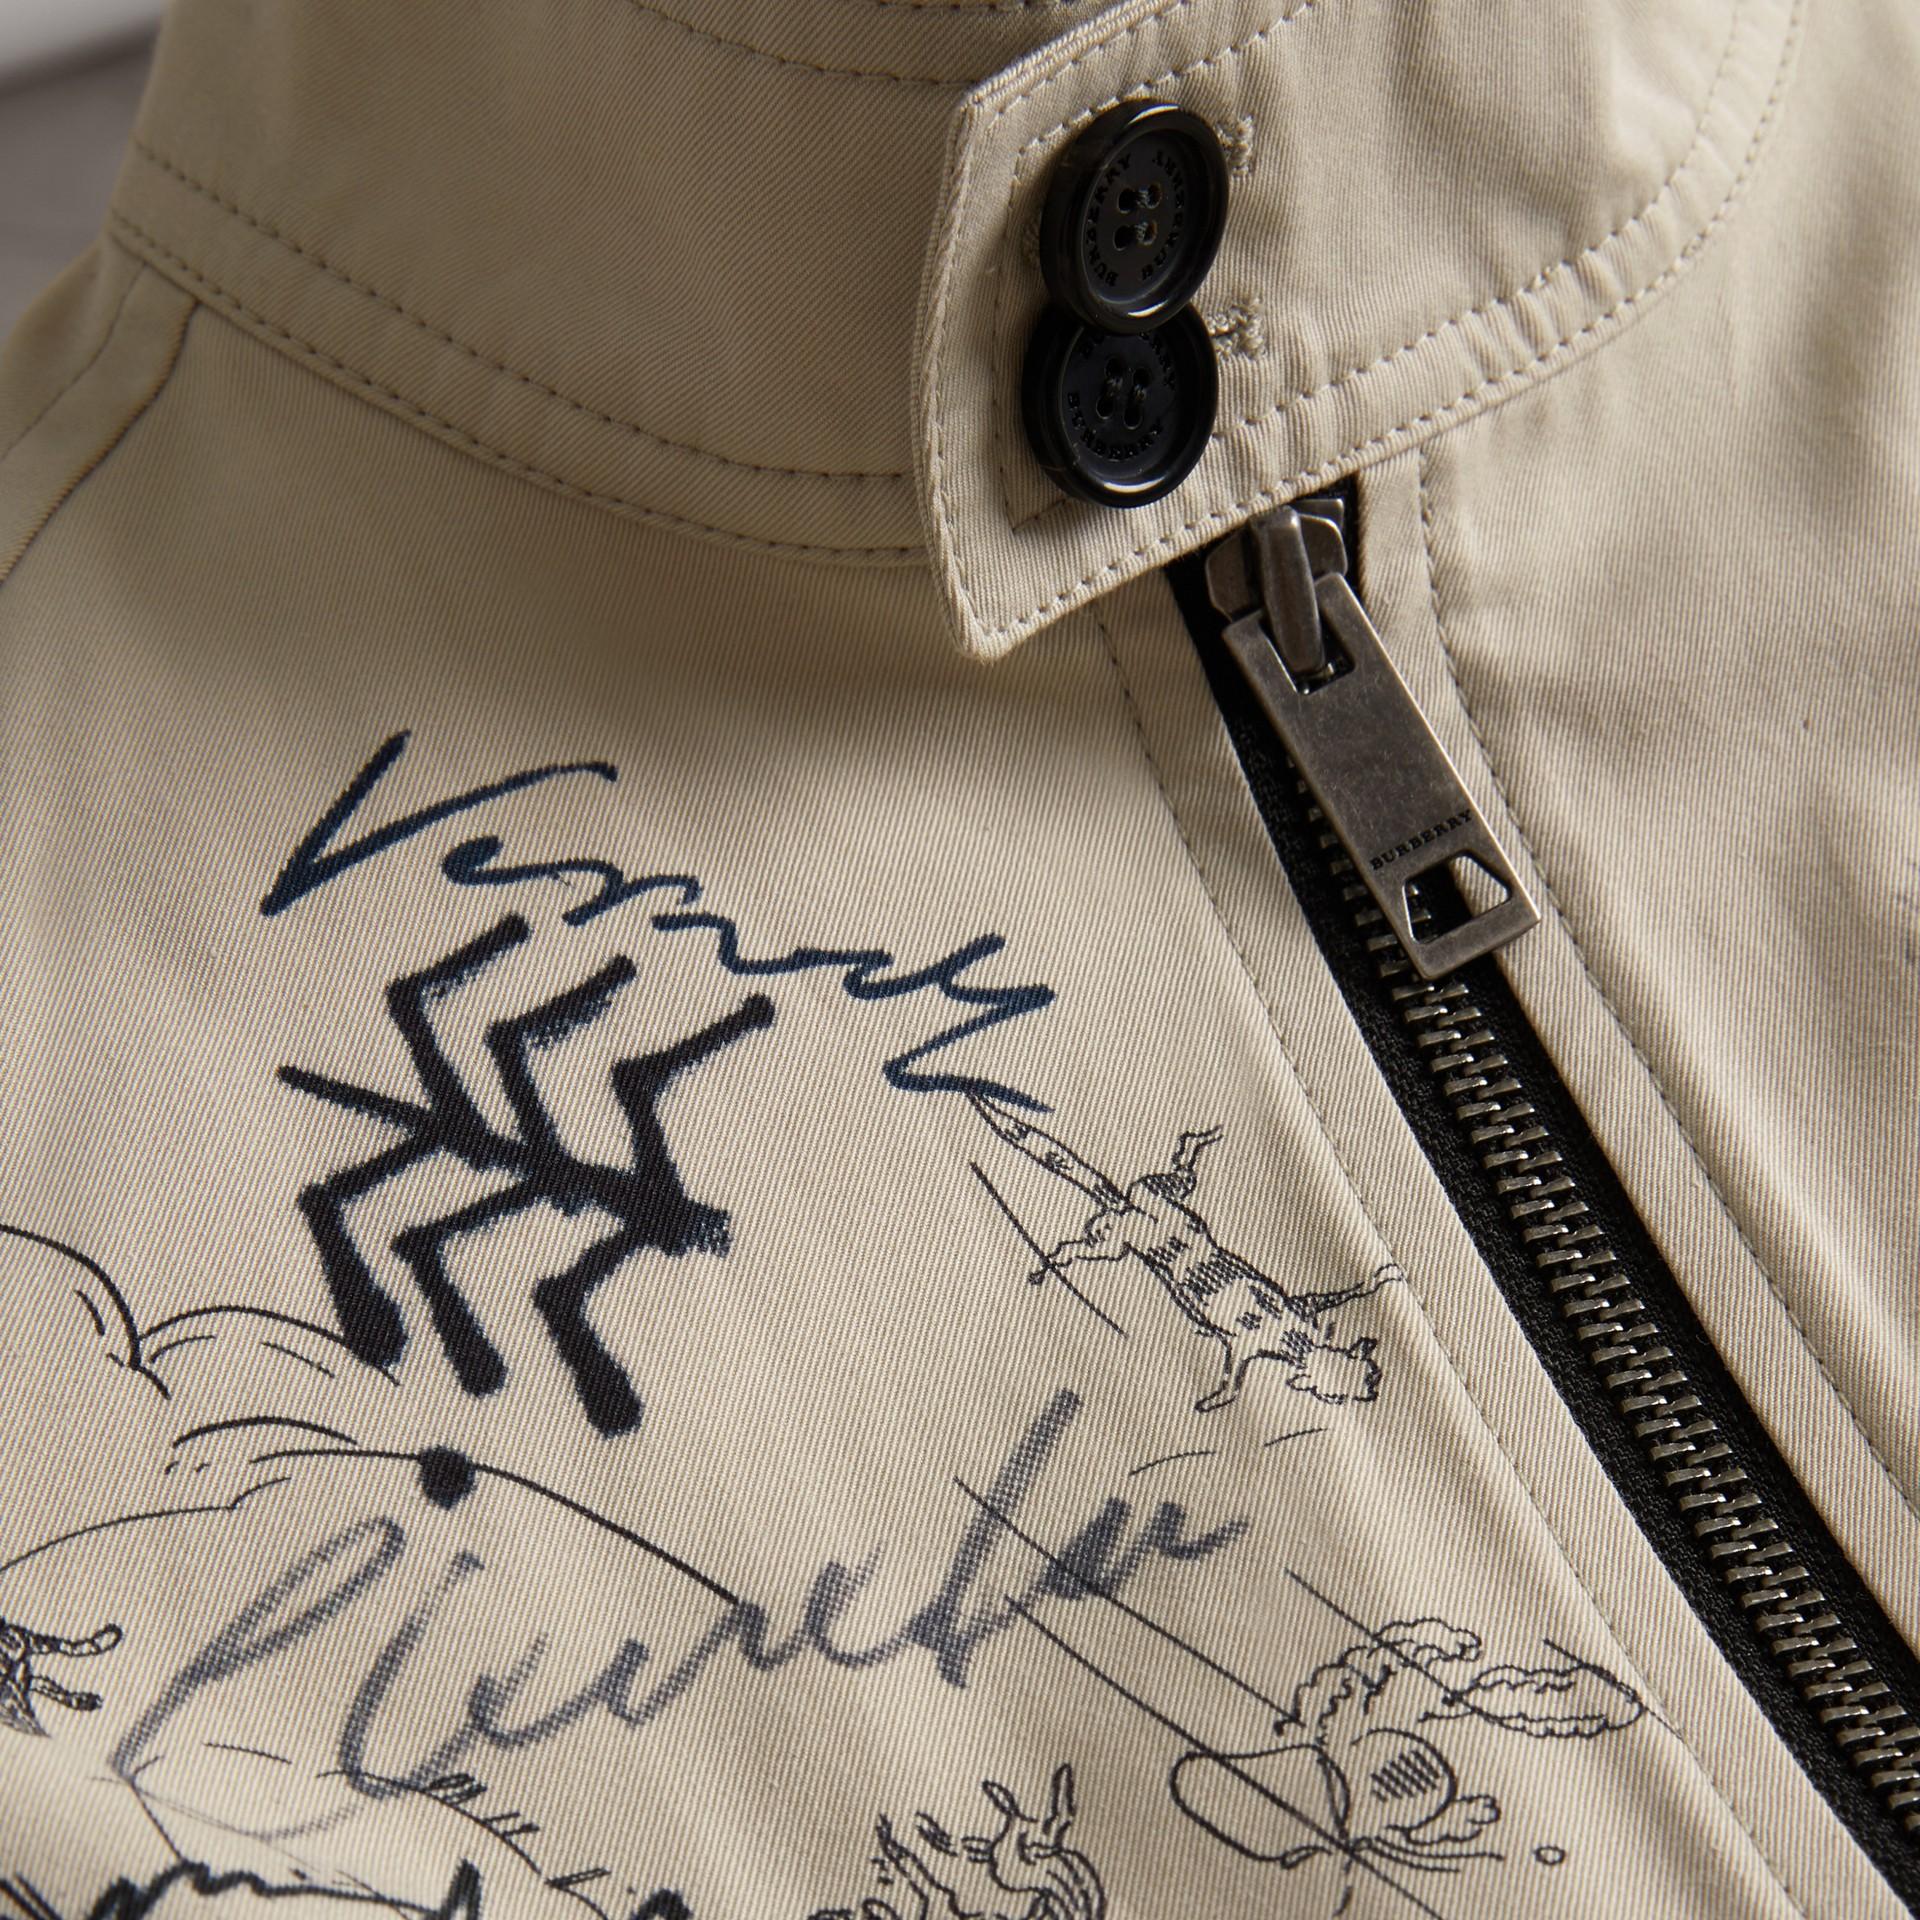 Adventure Print Gabardine Harrington Jacket in Stone | Burberry - gallery image 1